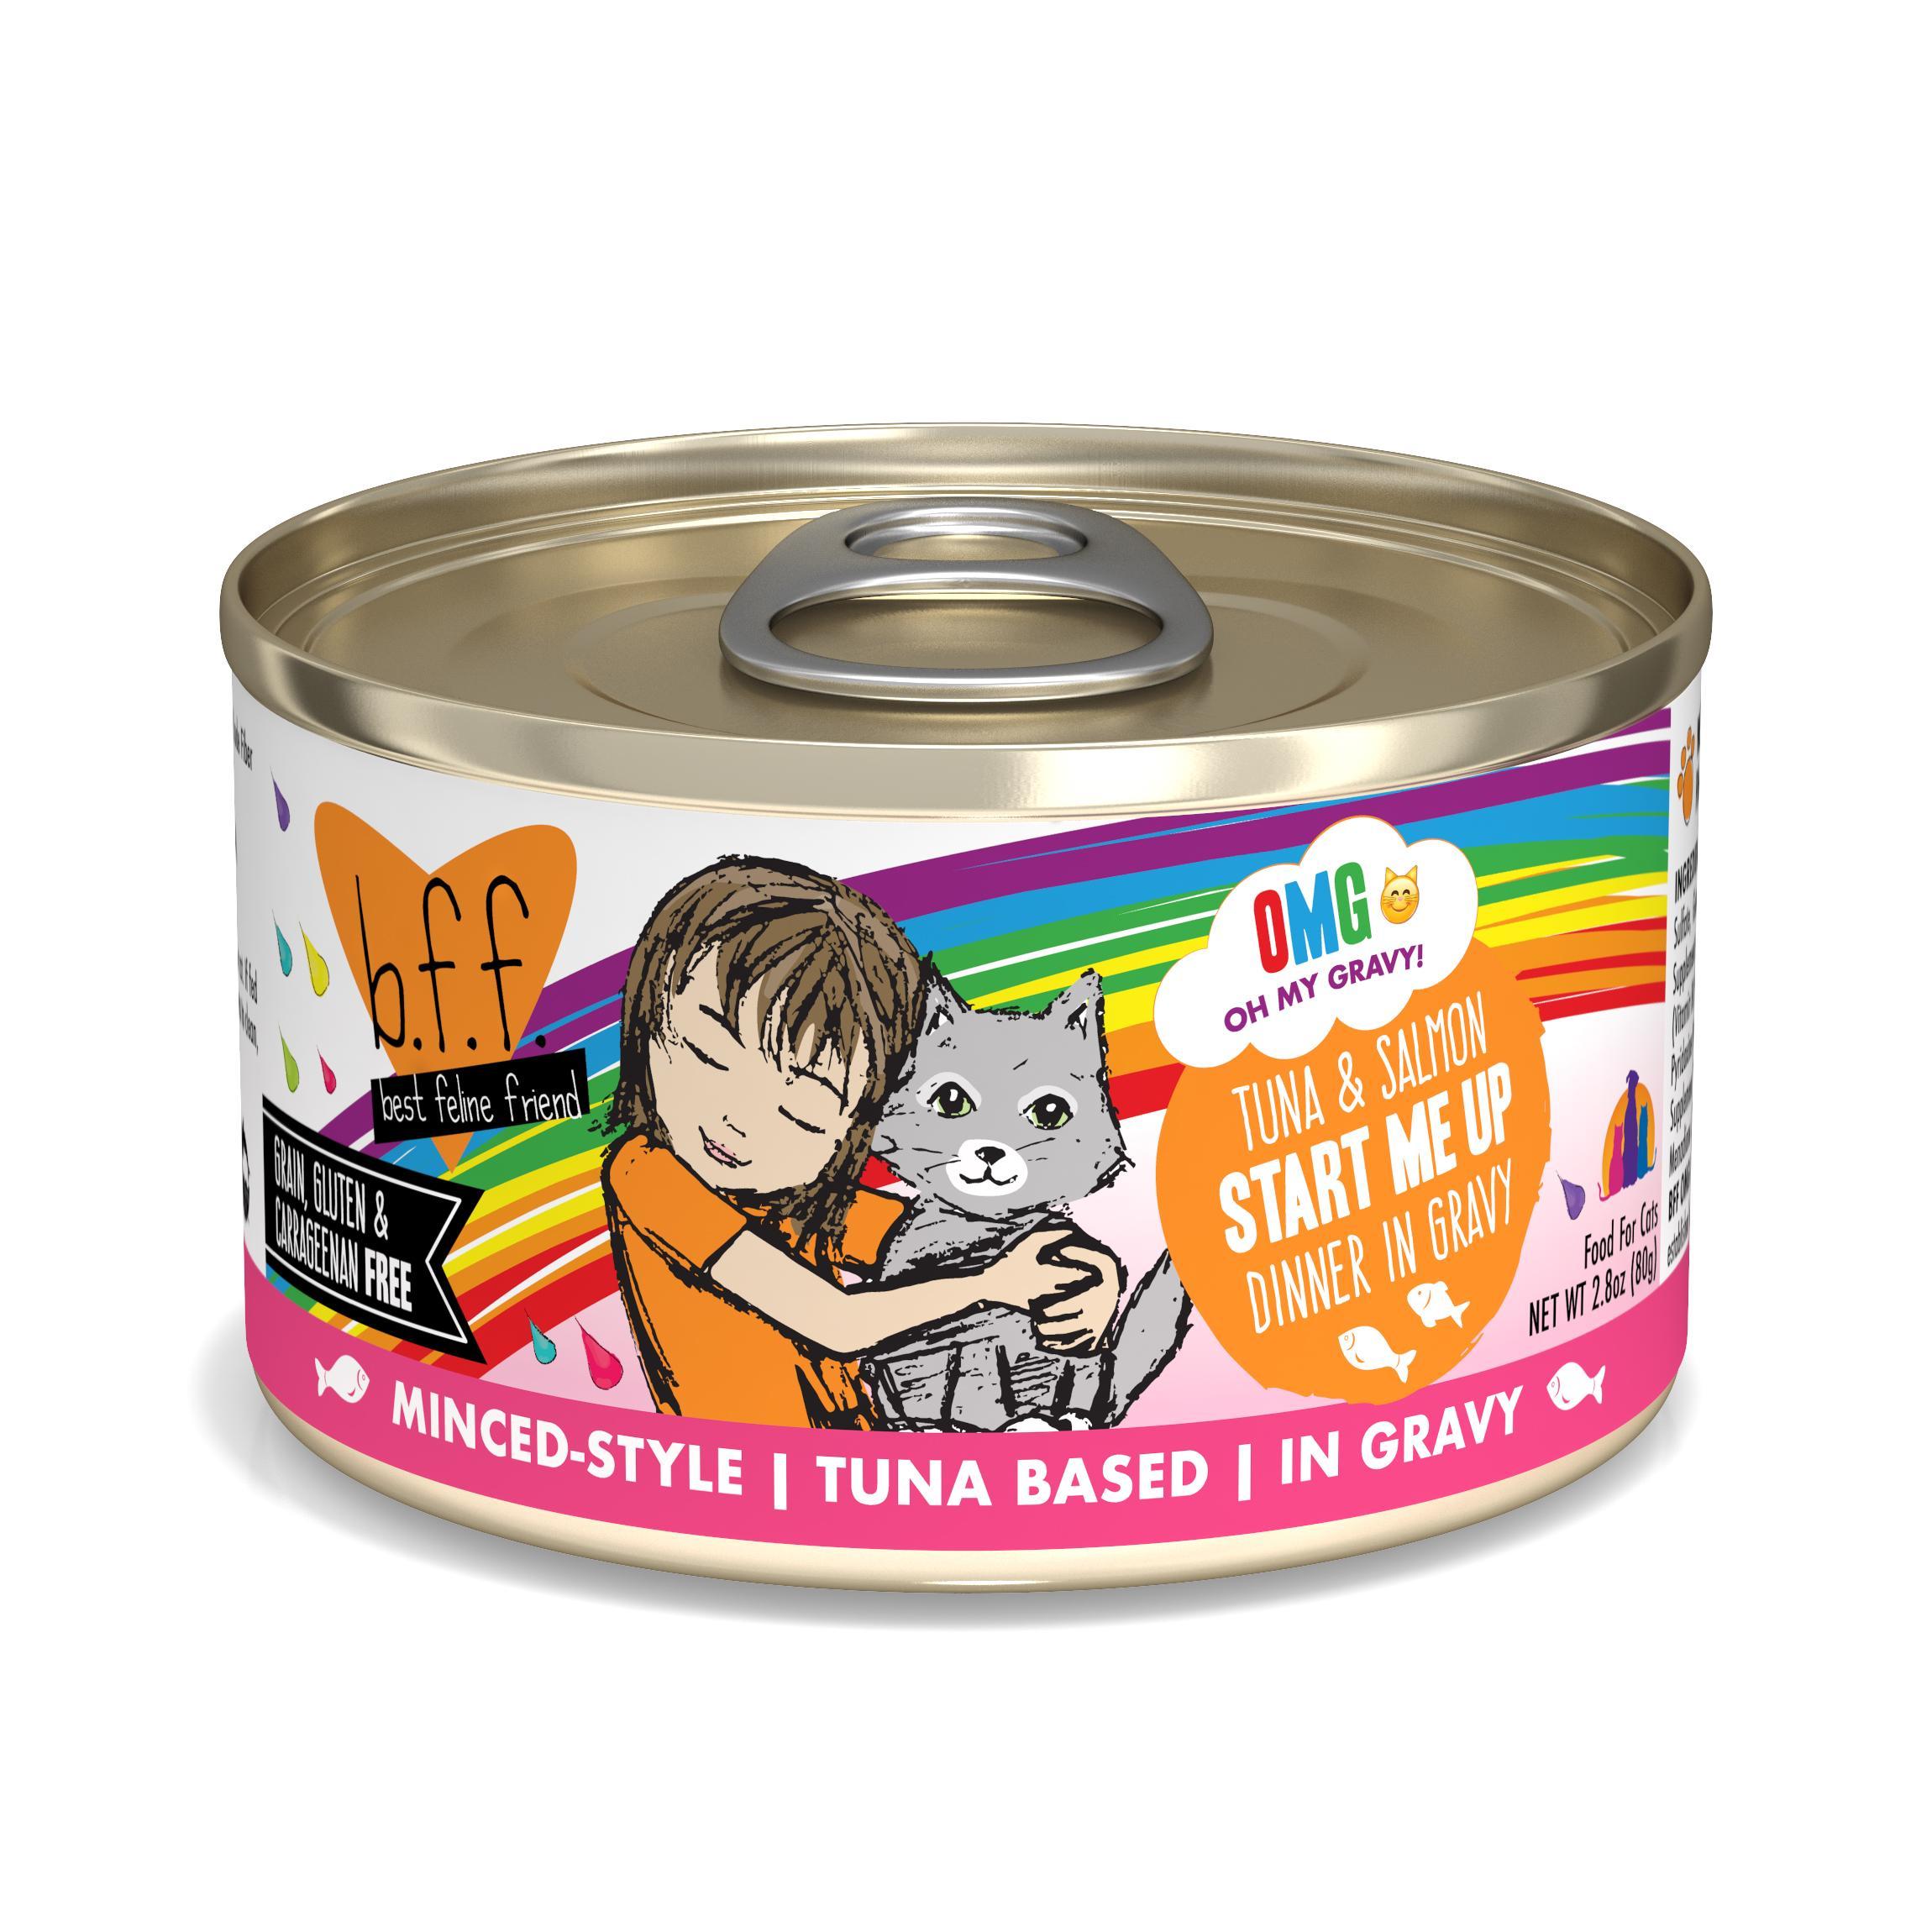 BFF Oh My Gravy! Start Me Up! Tuna & Salmon Dinner in Gravy Grain-Free Wet Cat Food, 2.8-oz